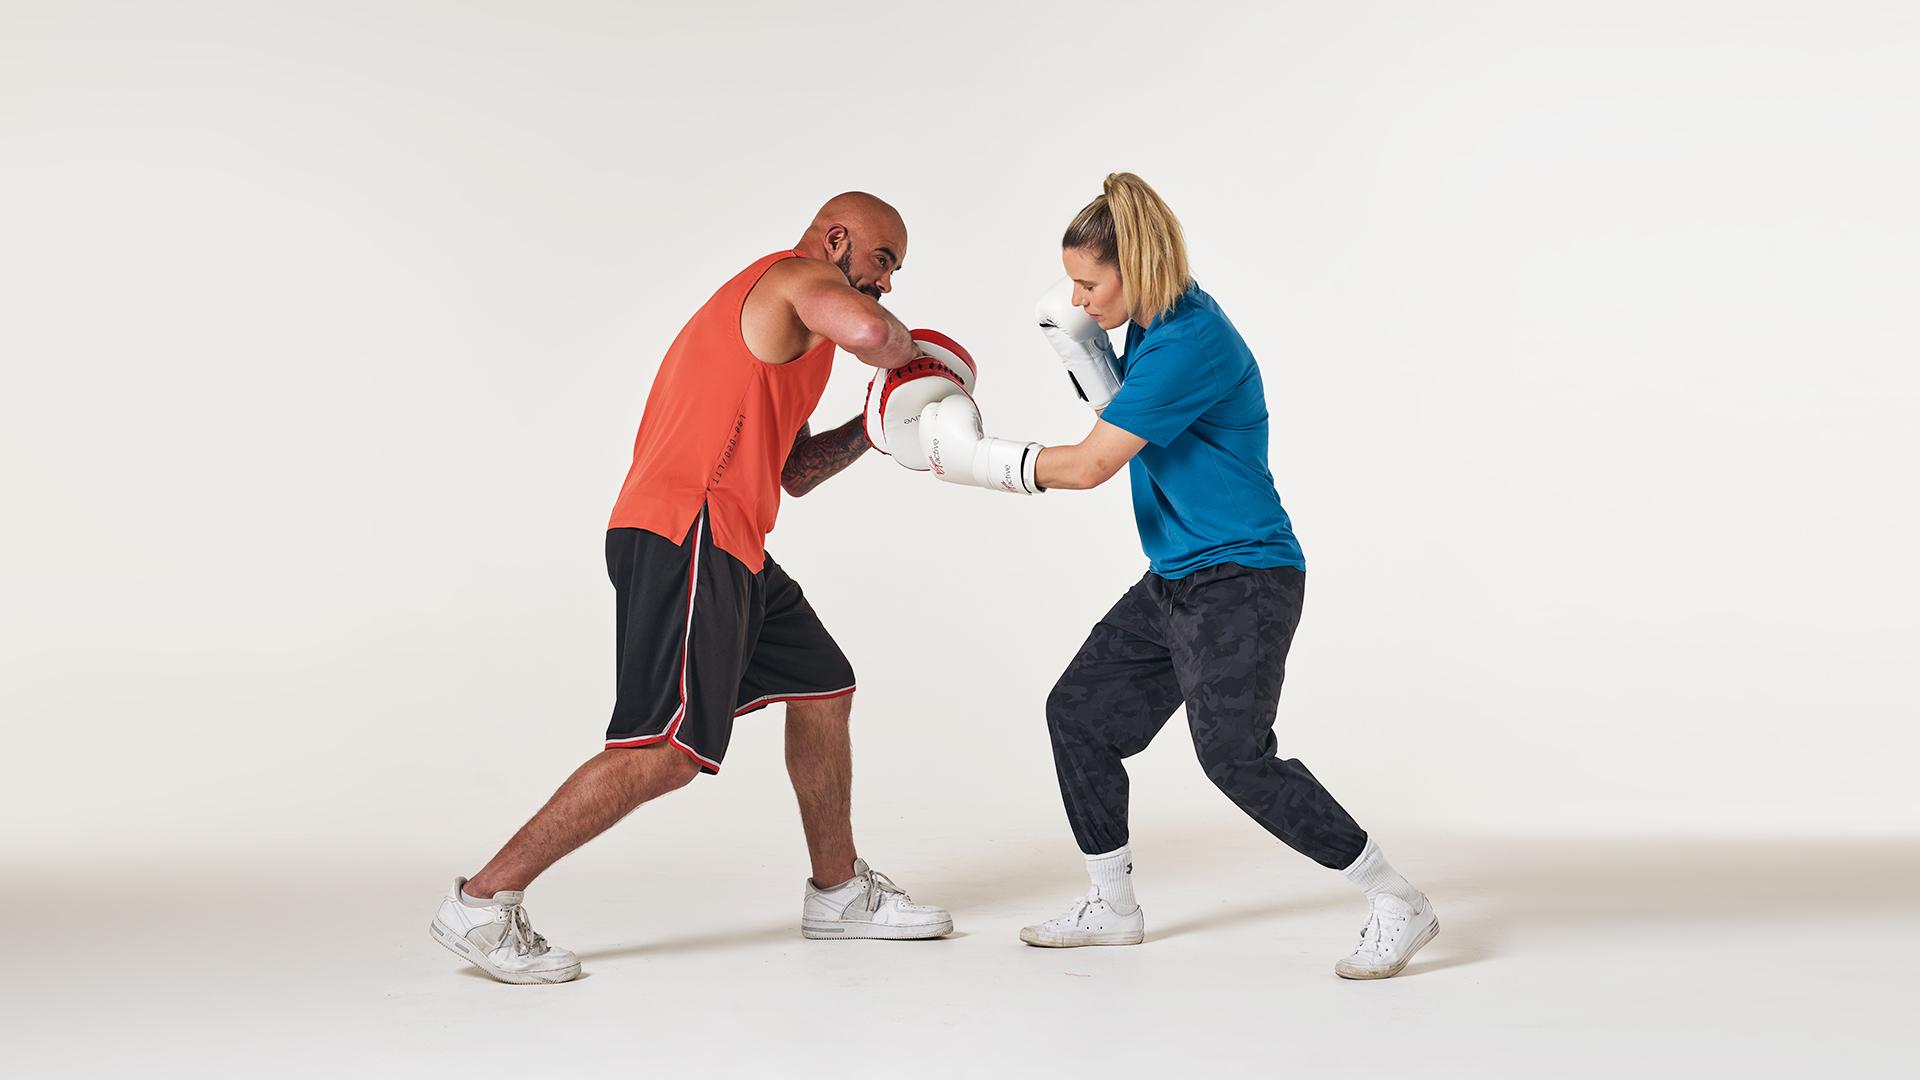 Boxing pad work